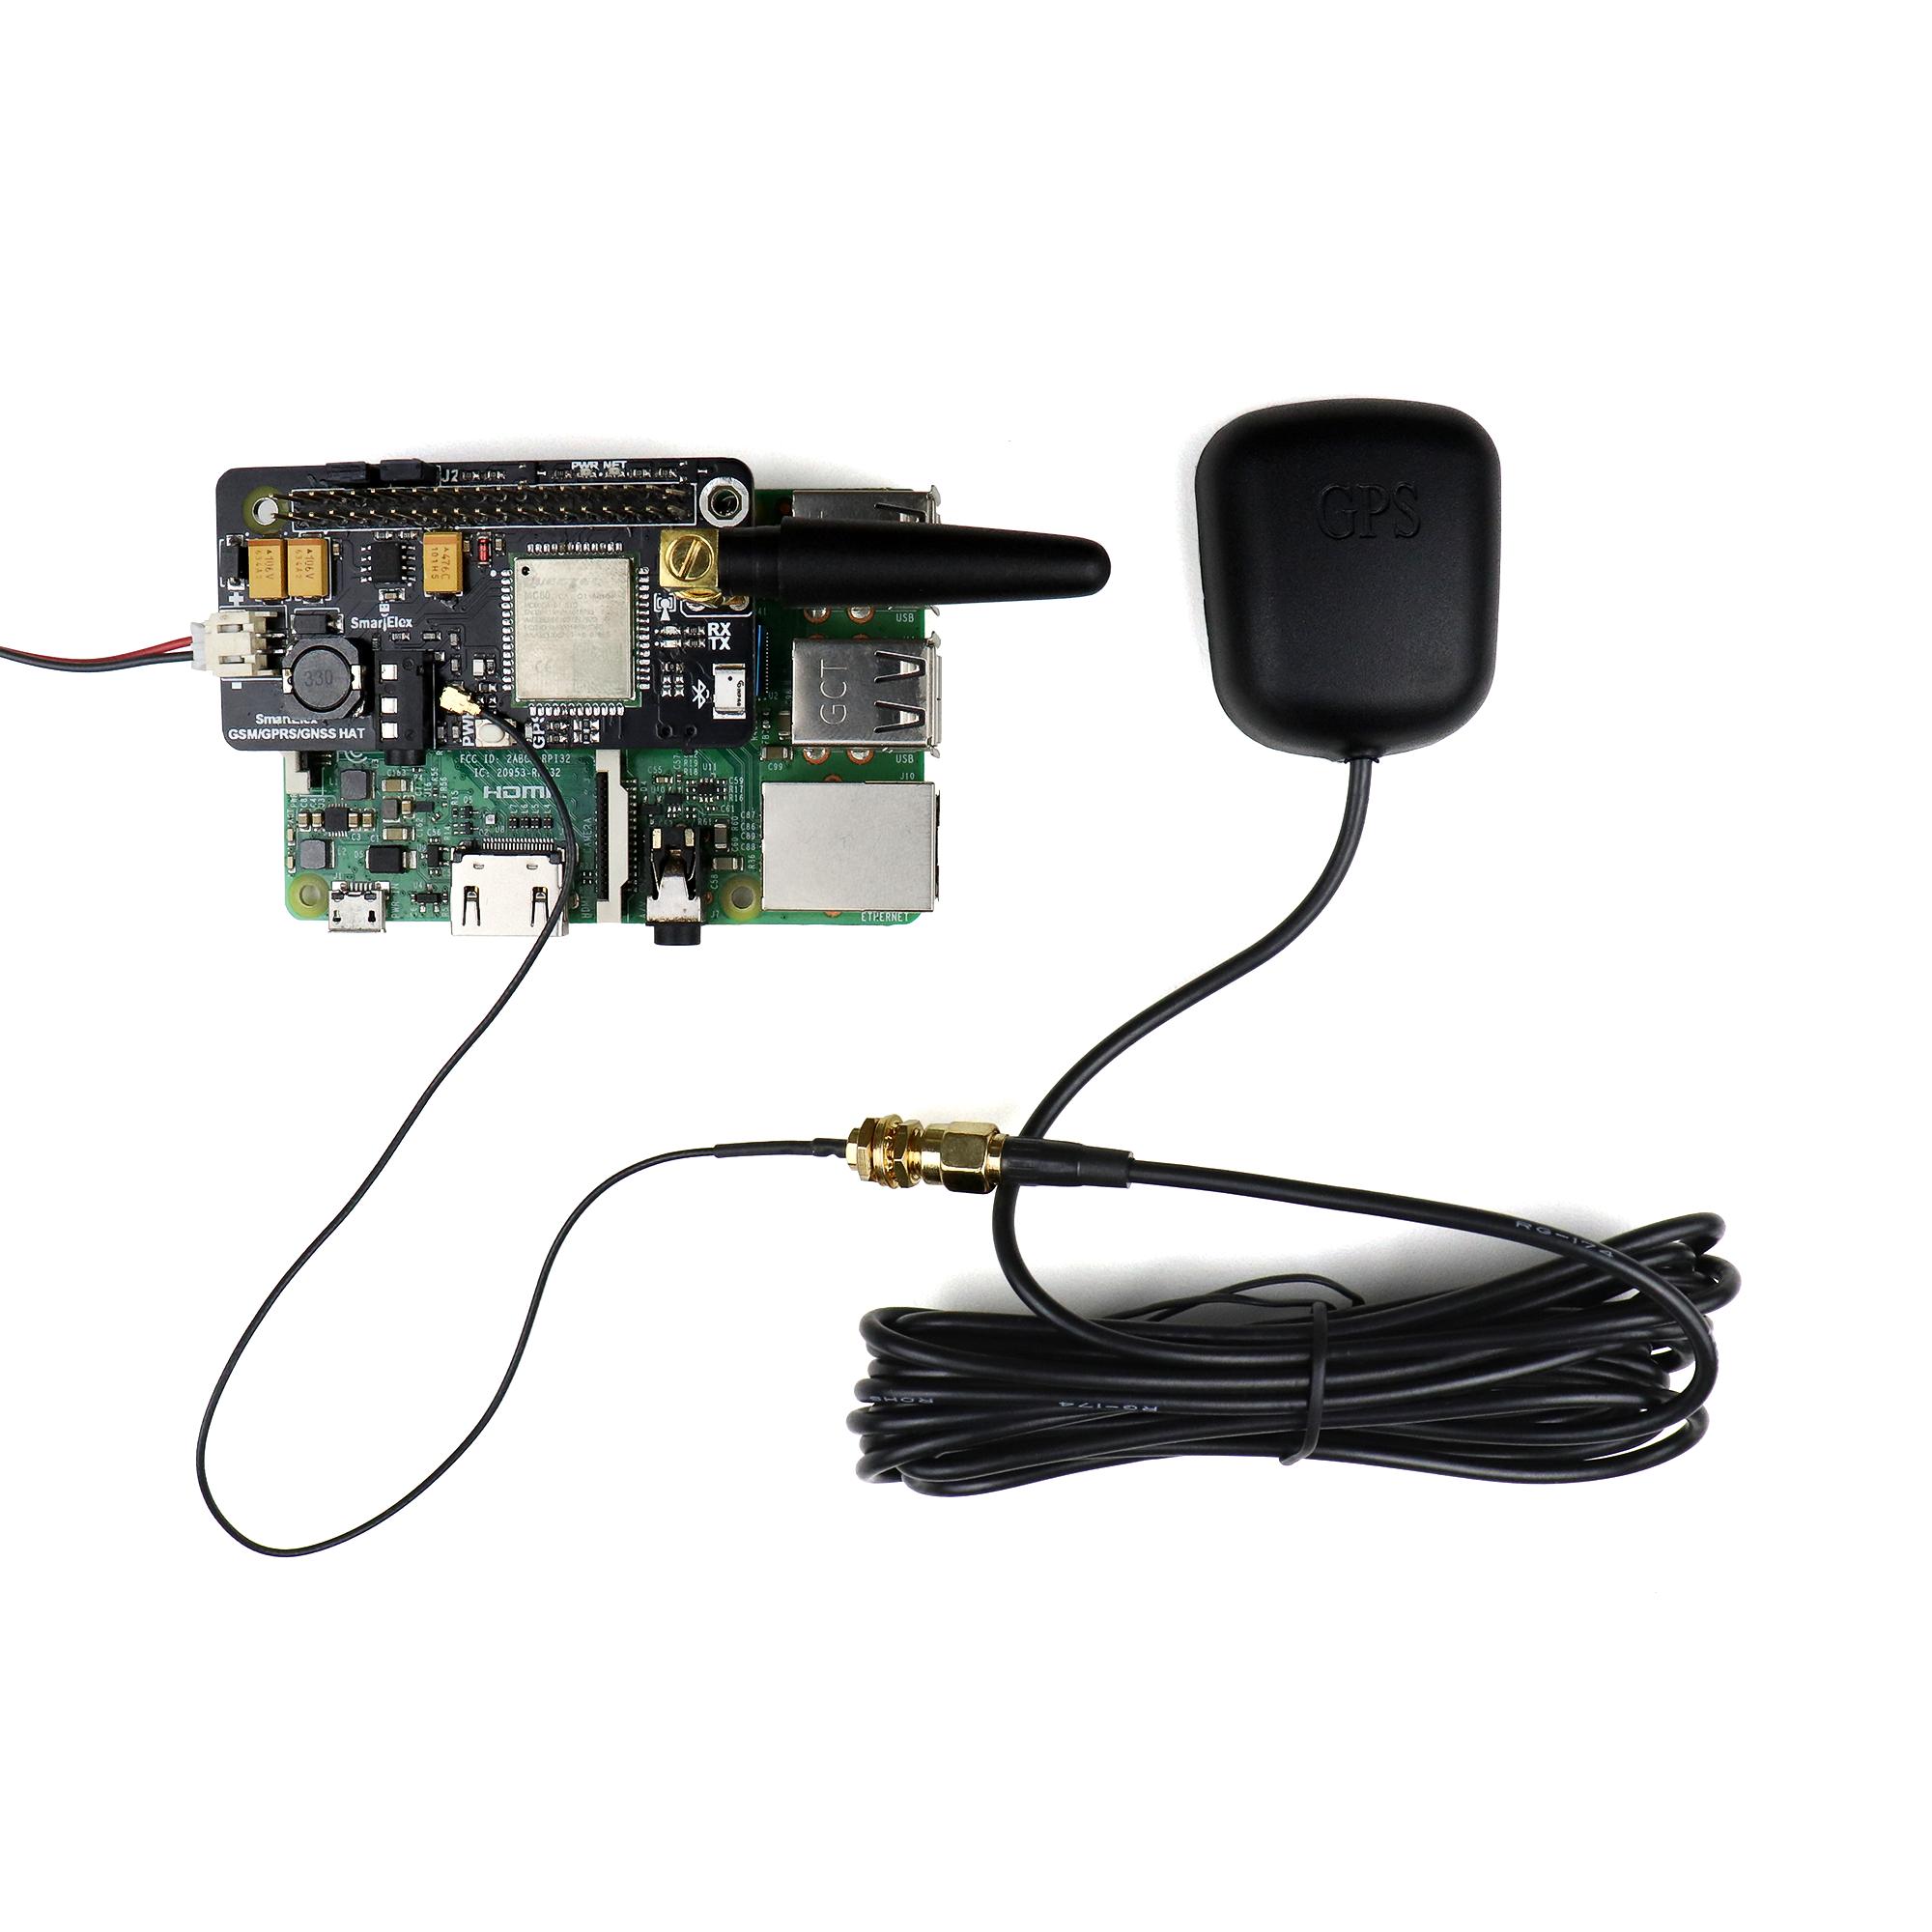 SmartElex GSM/GPRS/GNSS Bluetooth HAT for Raspberry Pi